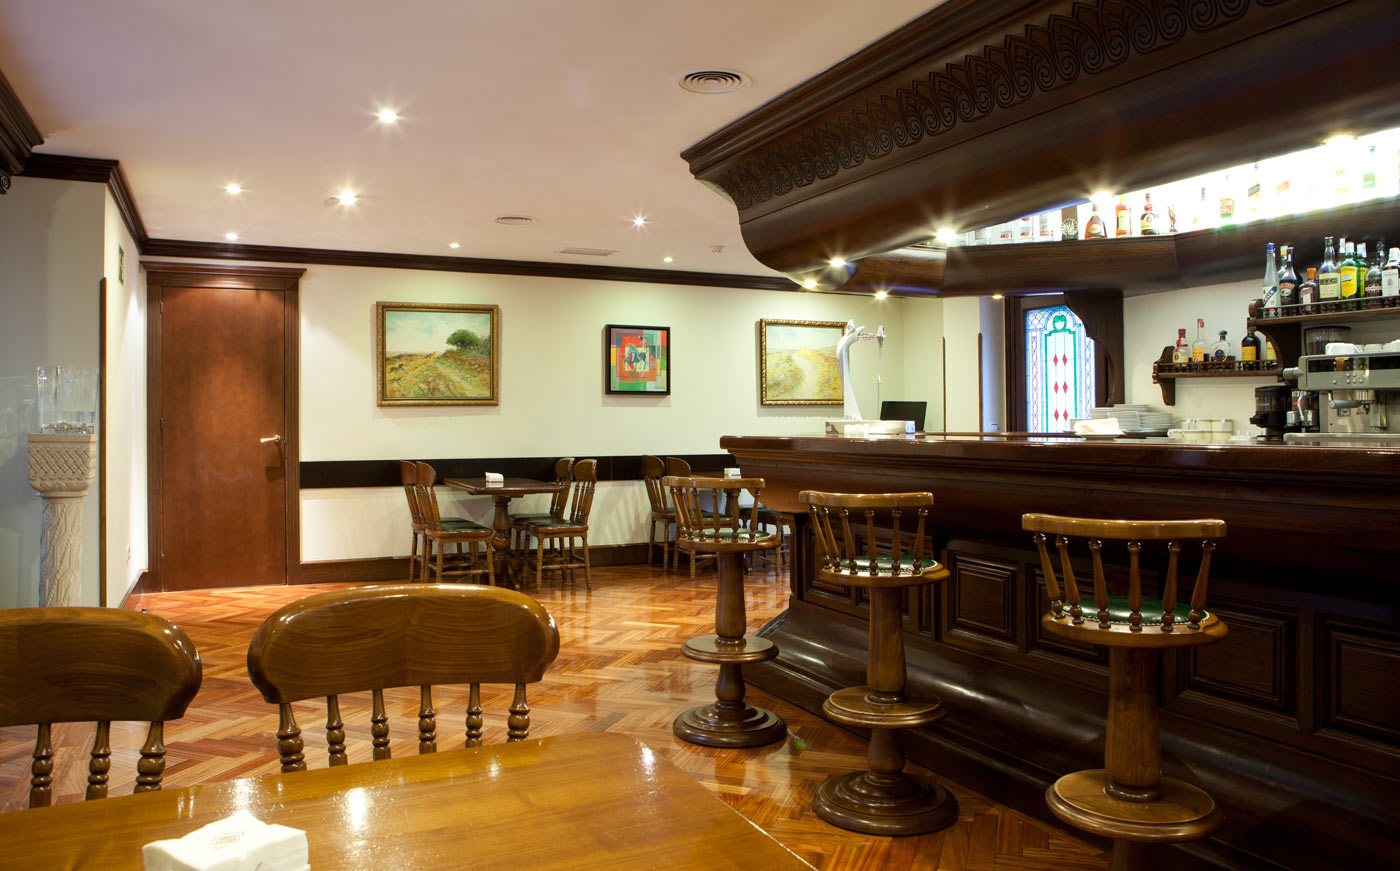 Hotel Don Pio - Cafeteria